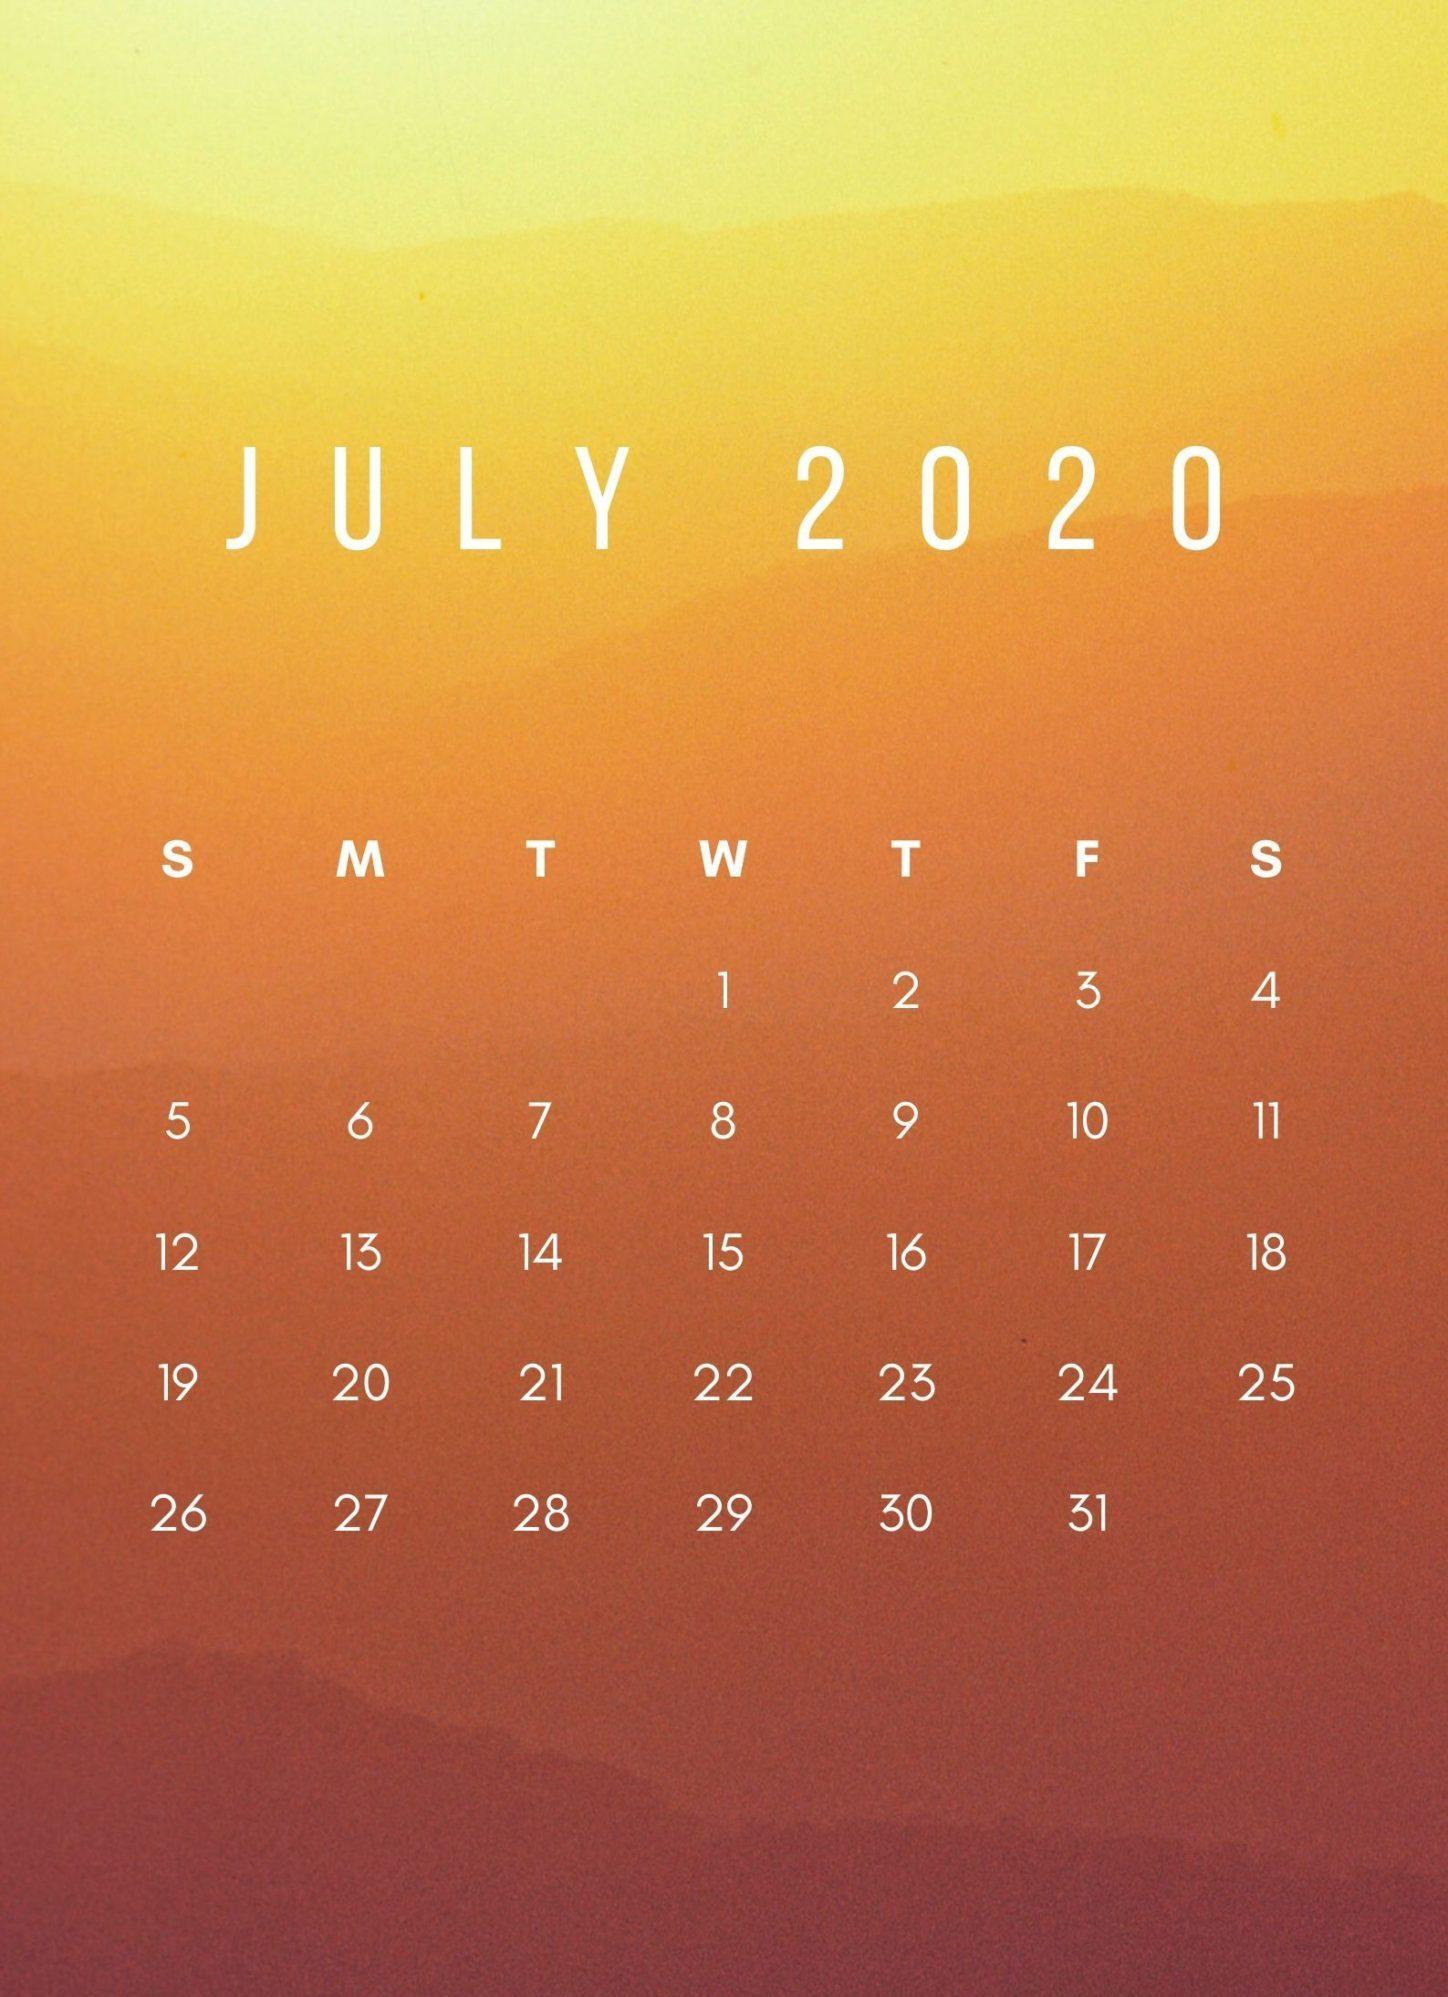 July 2020 Calendar Sunrise Wallpaper